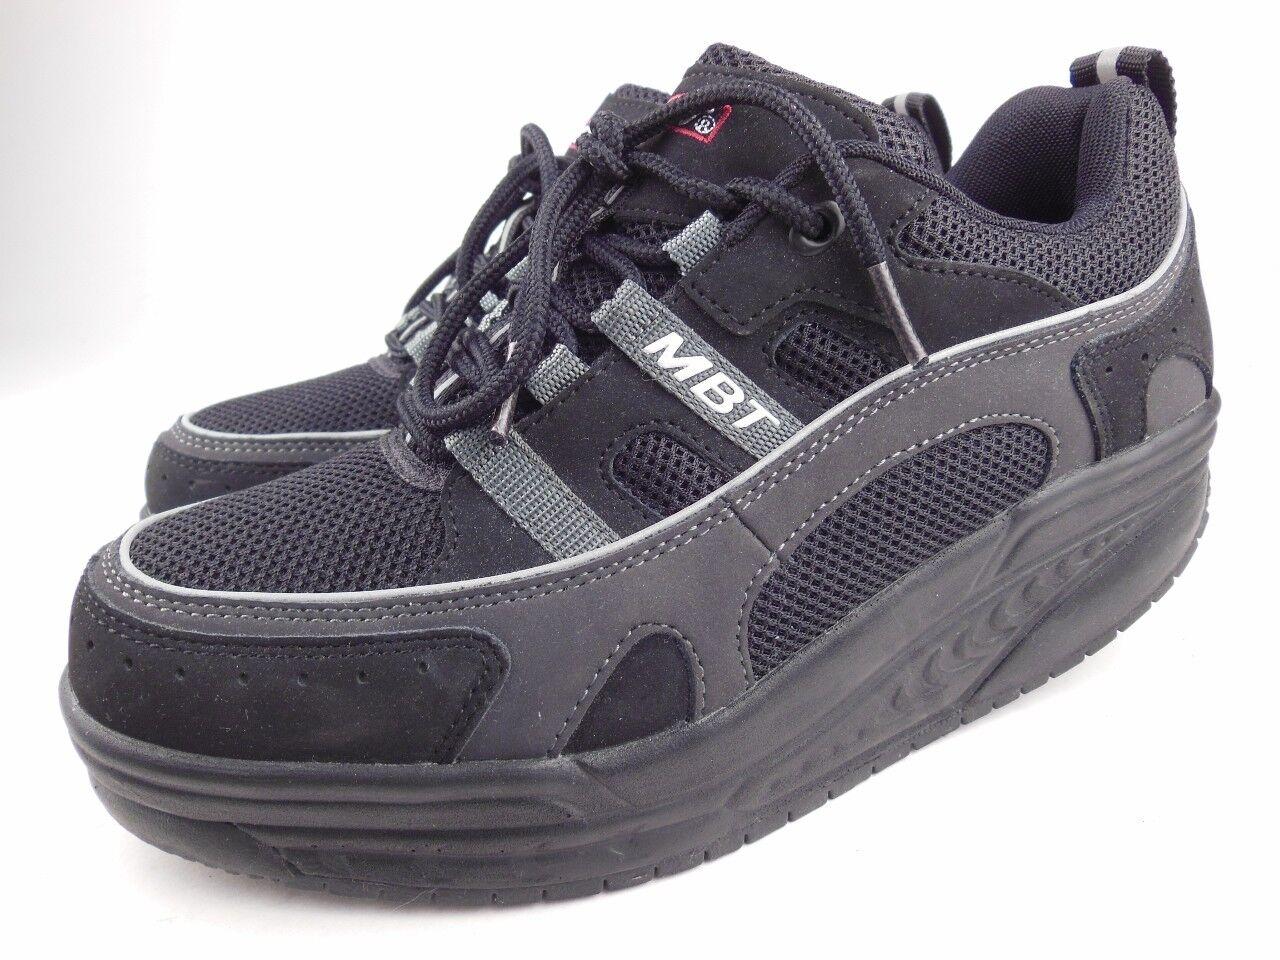 MBT Sport 03 03 03  noir  Leather Mesh Lace Up Walking Toning Sneakers c429e8